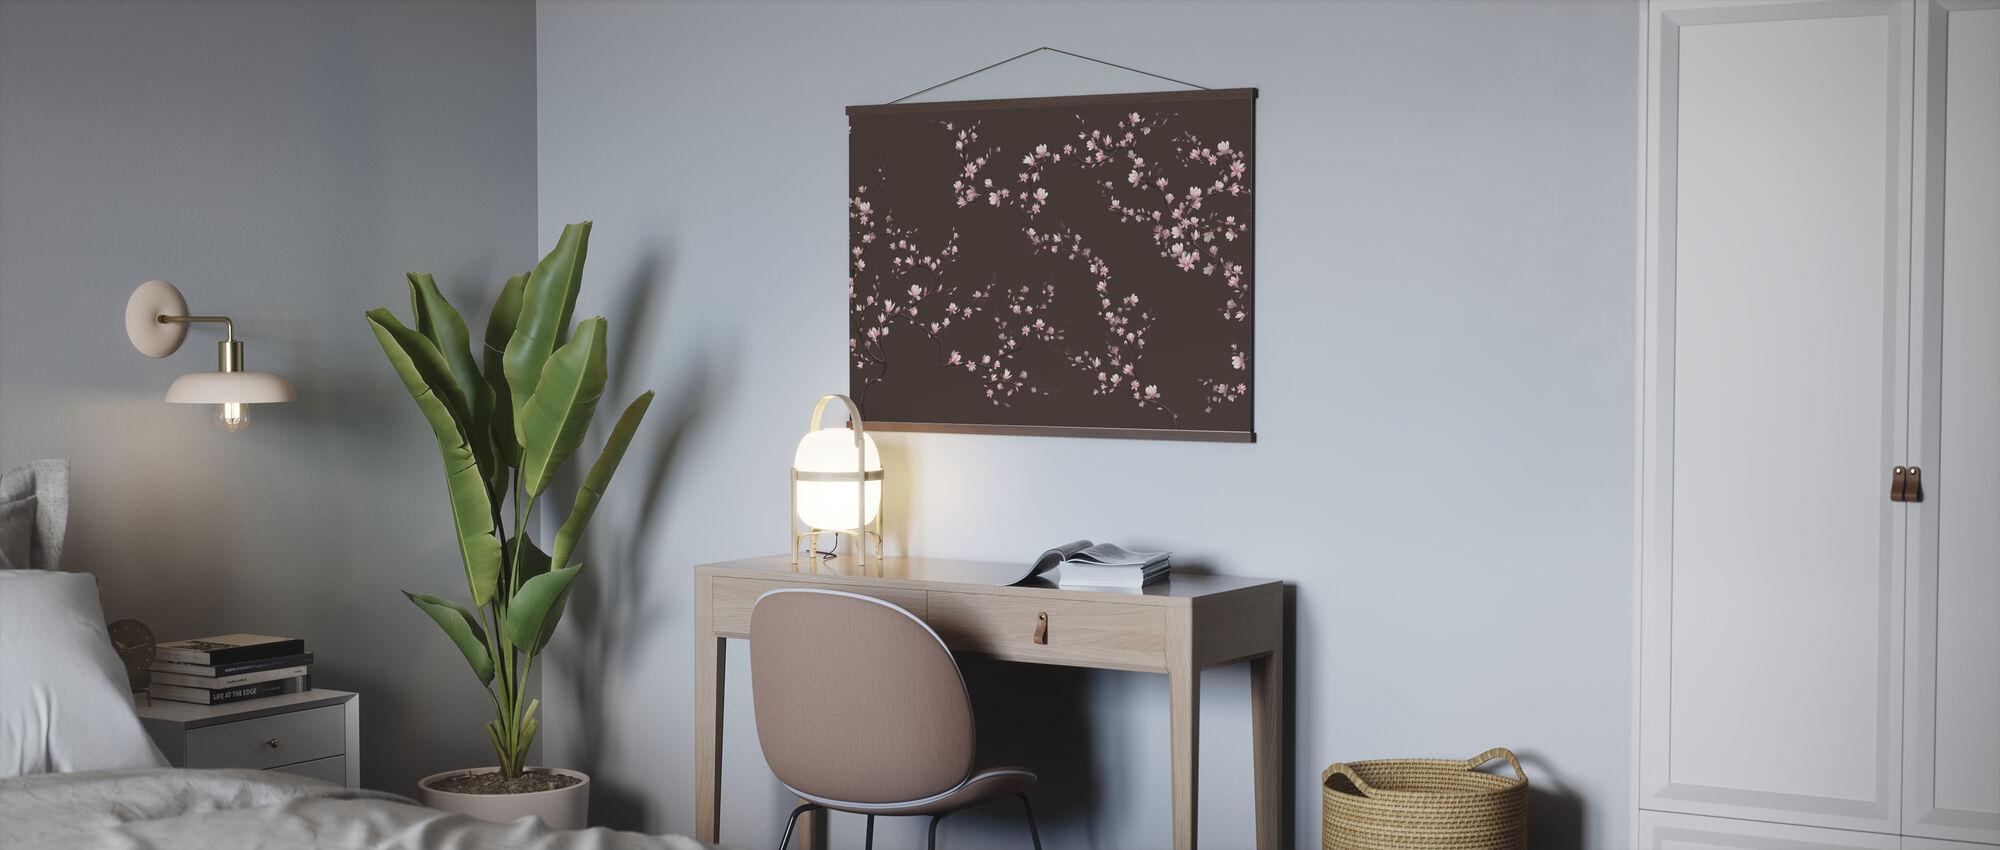 Flourishing Magnolia - Warm Brown - Poster - Office